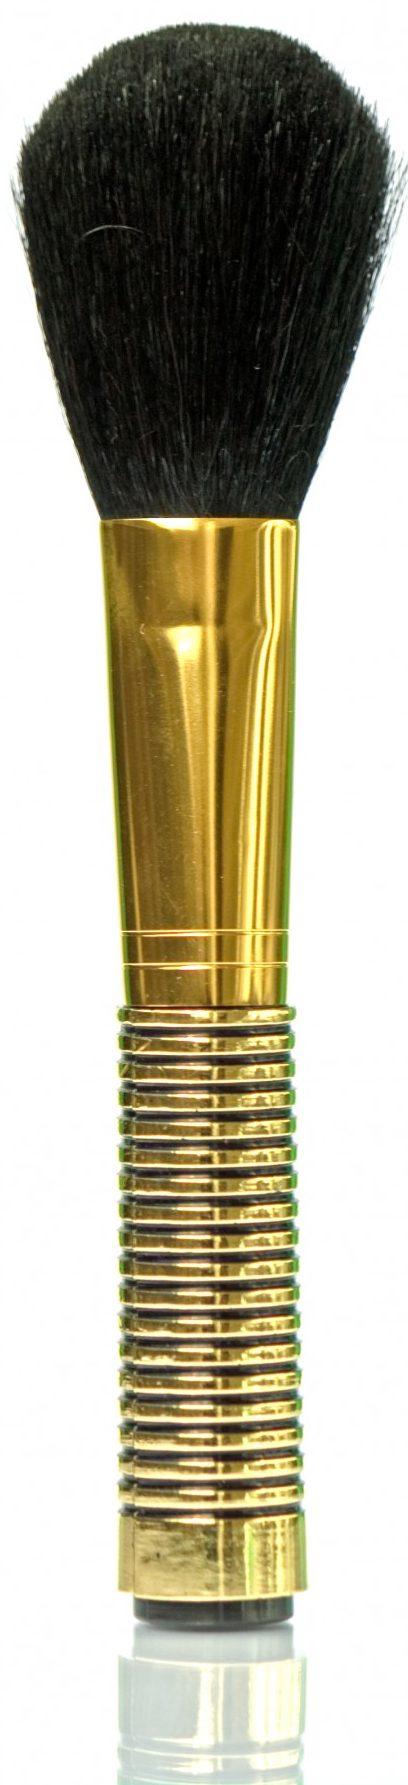 Make Up Brush E1579064010577